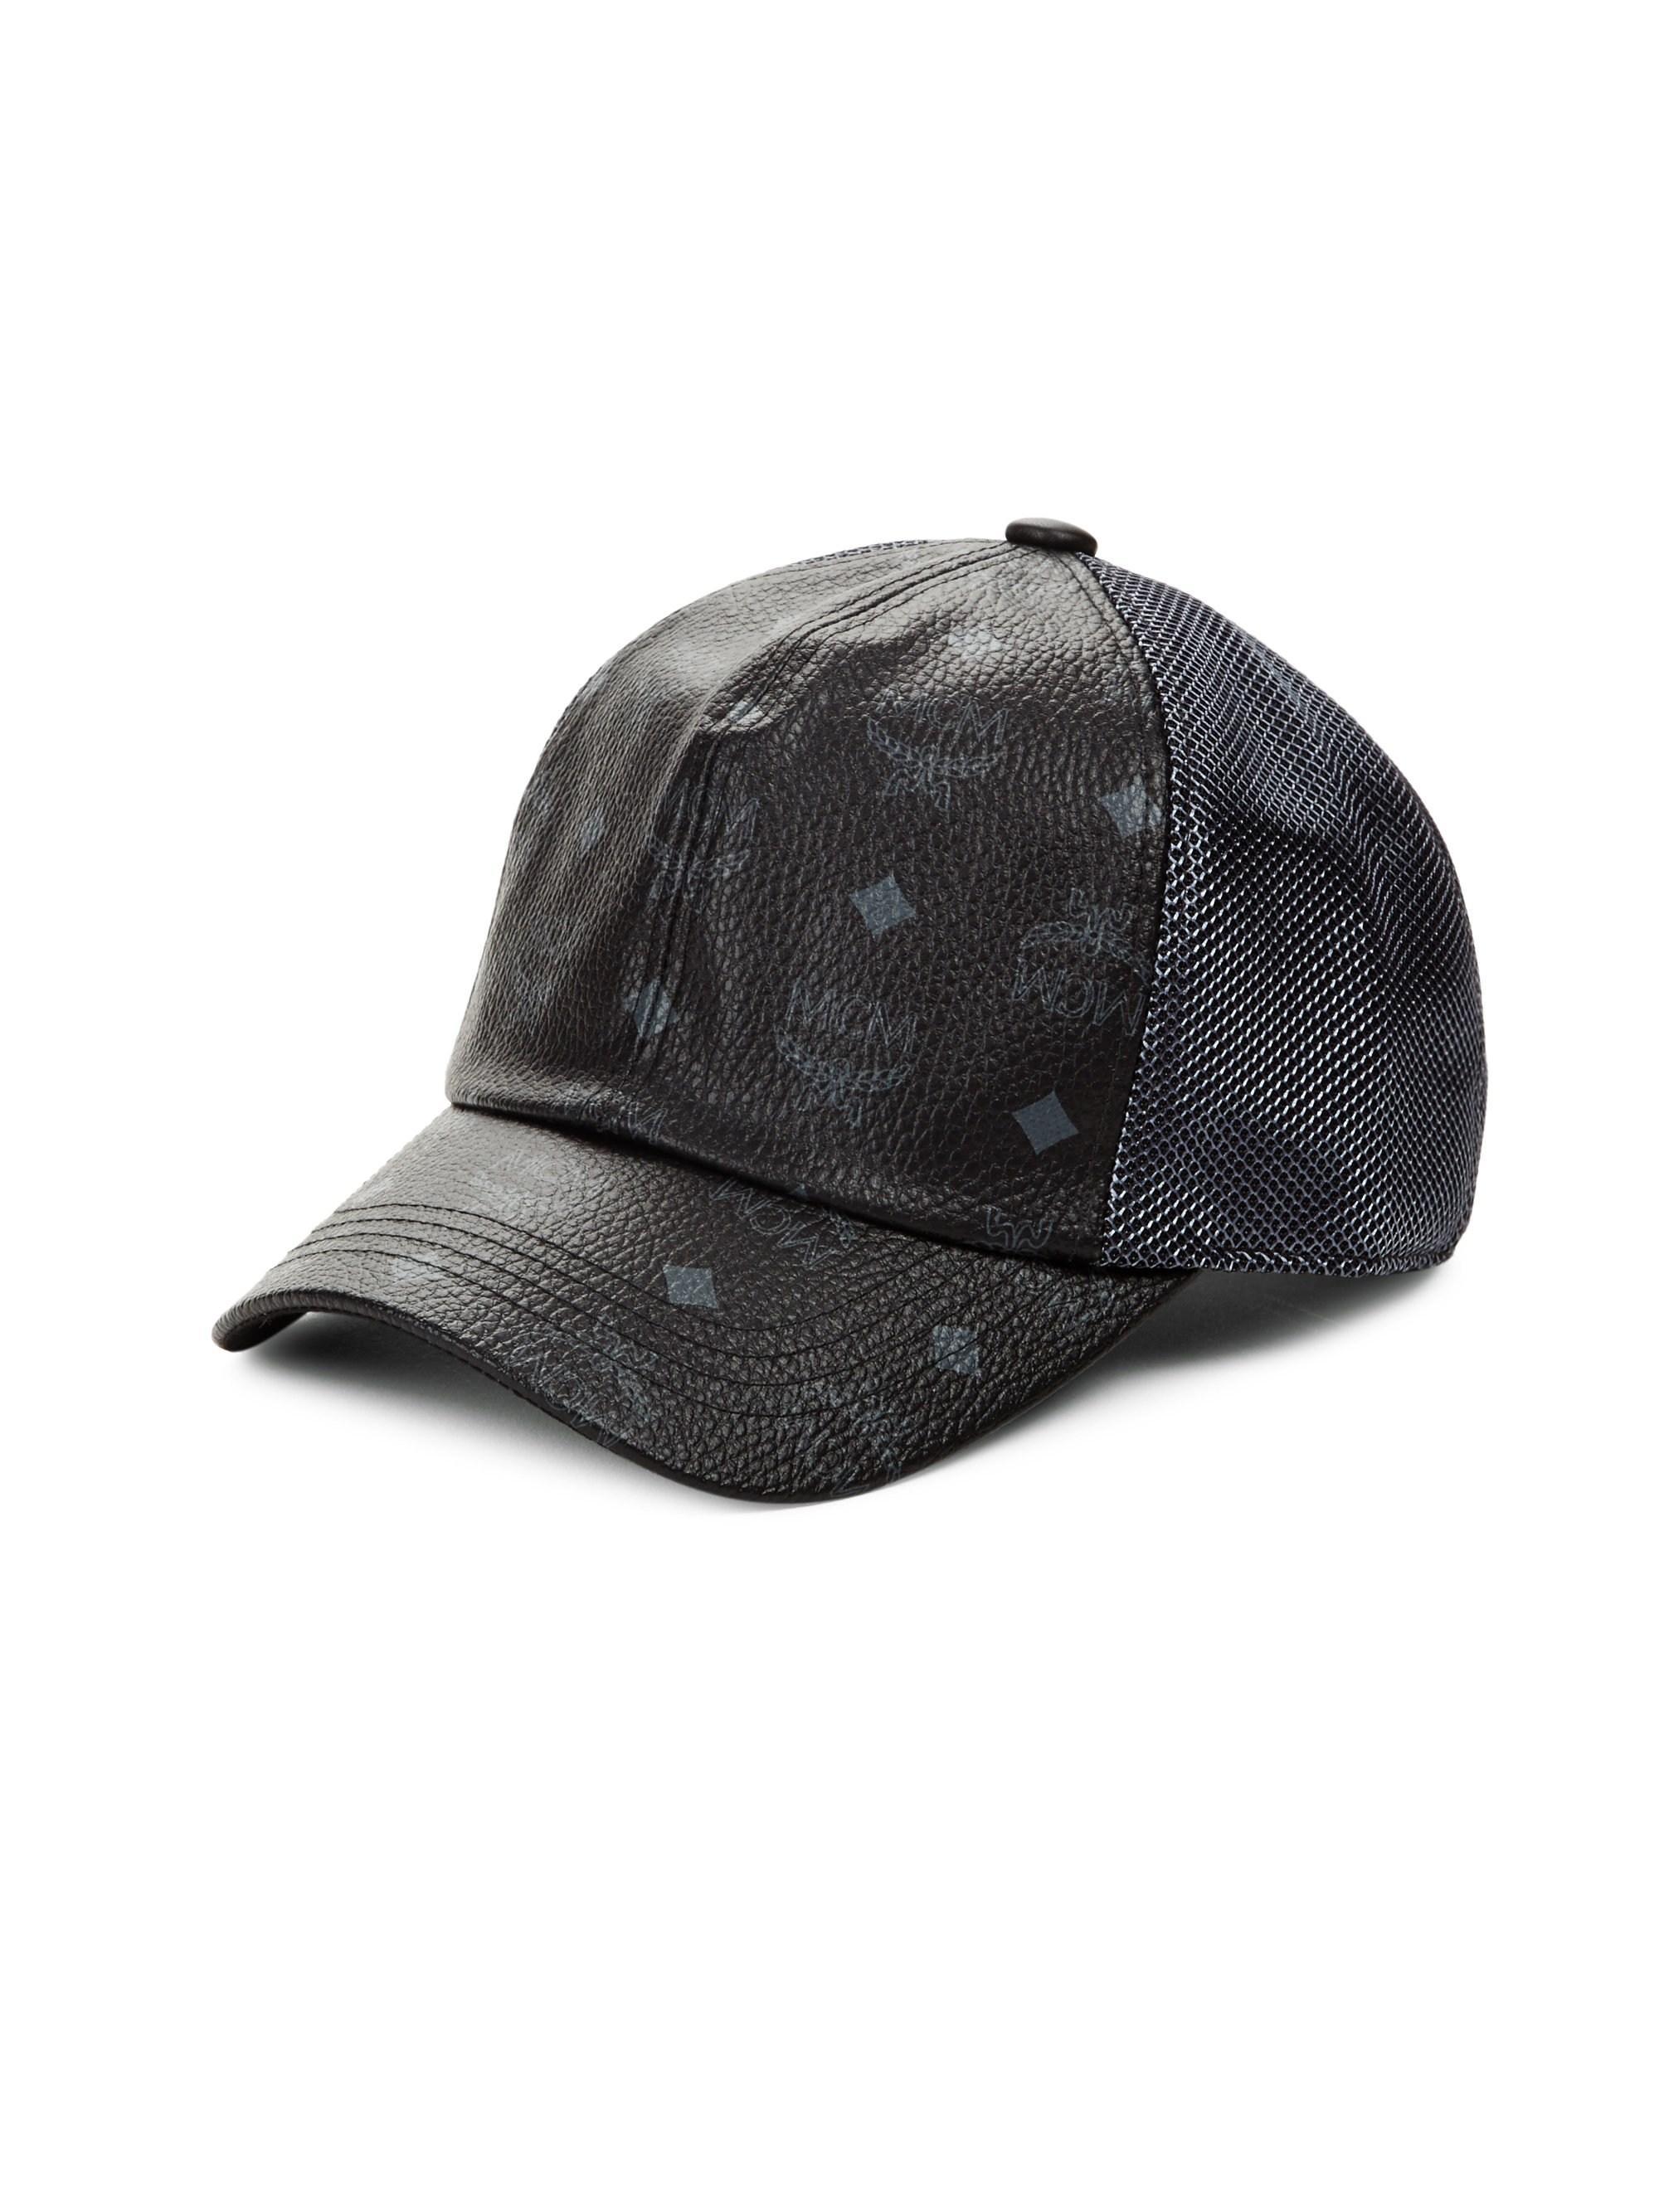 c3e2448071b Lyst - MCM Baseball Cap in Black for Men - Save 31%